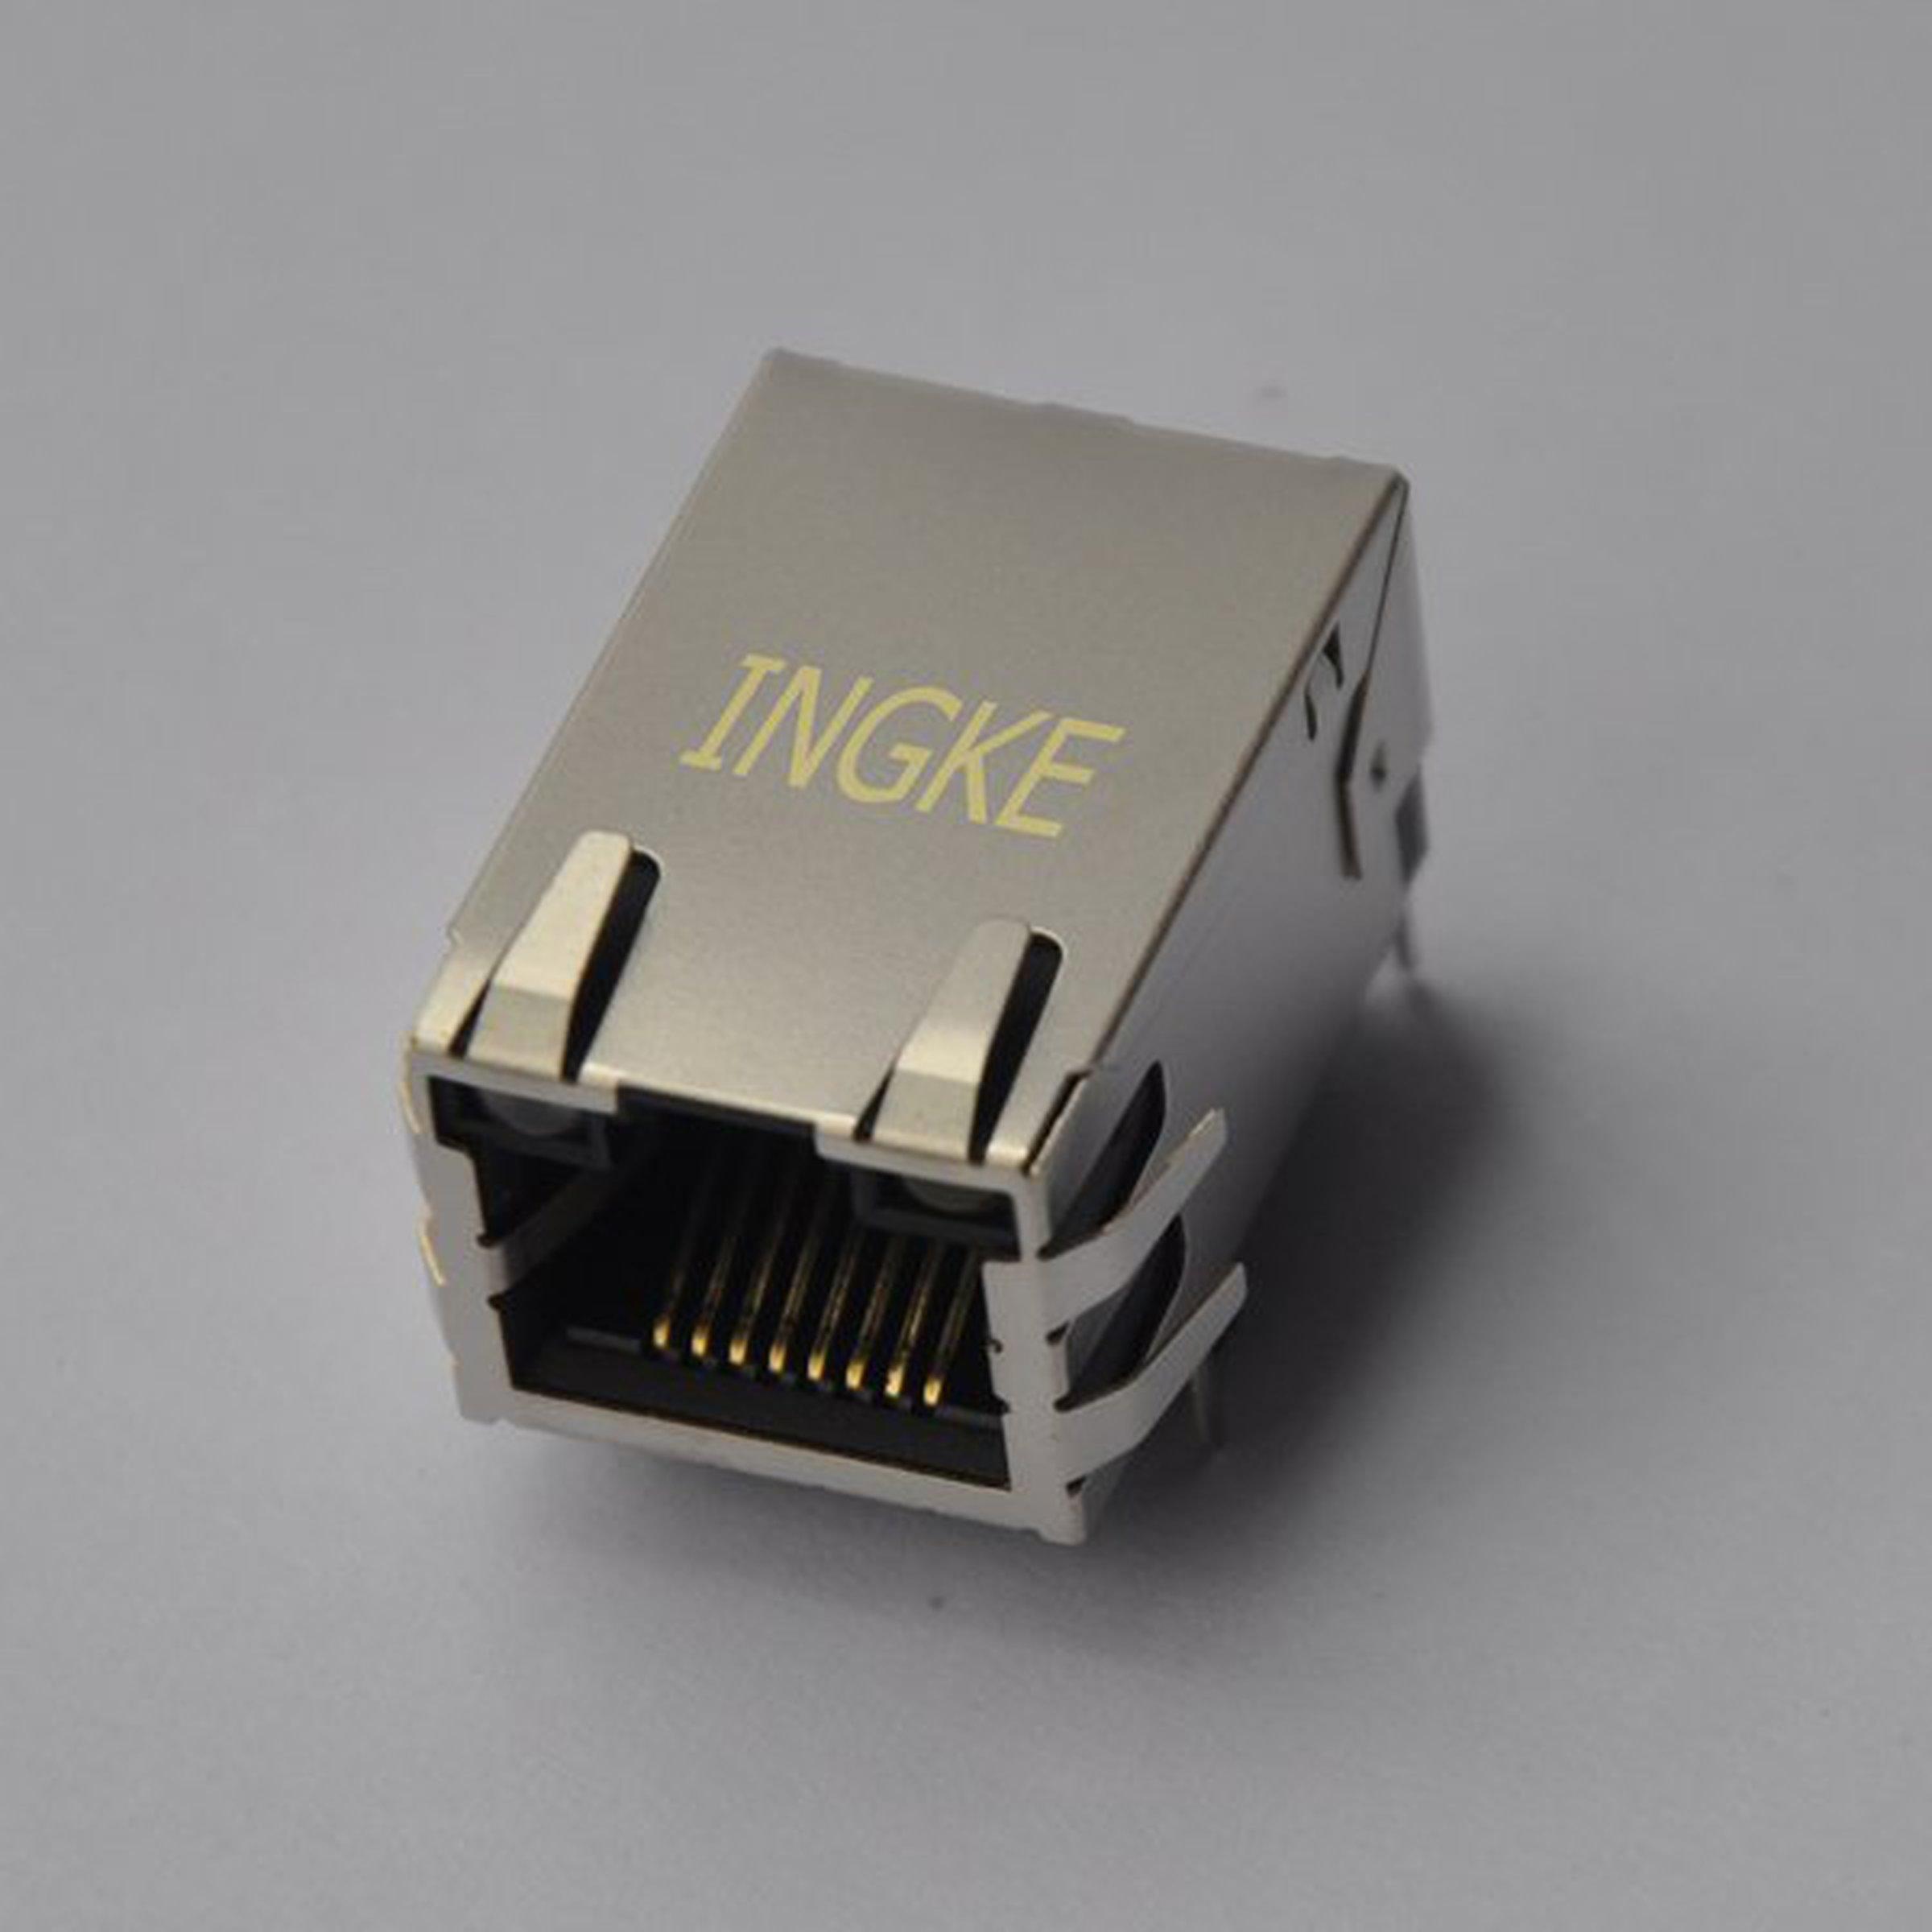 JD1-0001NL YKGU-8199NL Through Hole Magnetic RJ45 jacks